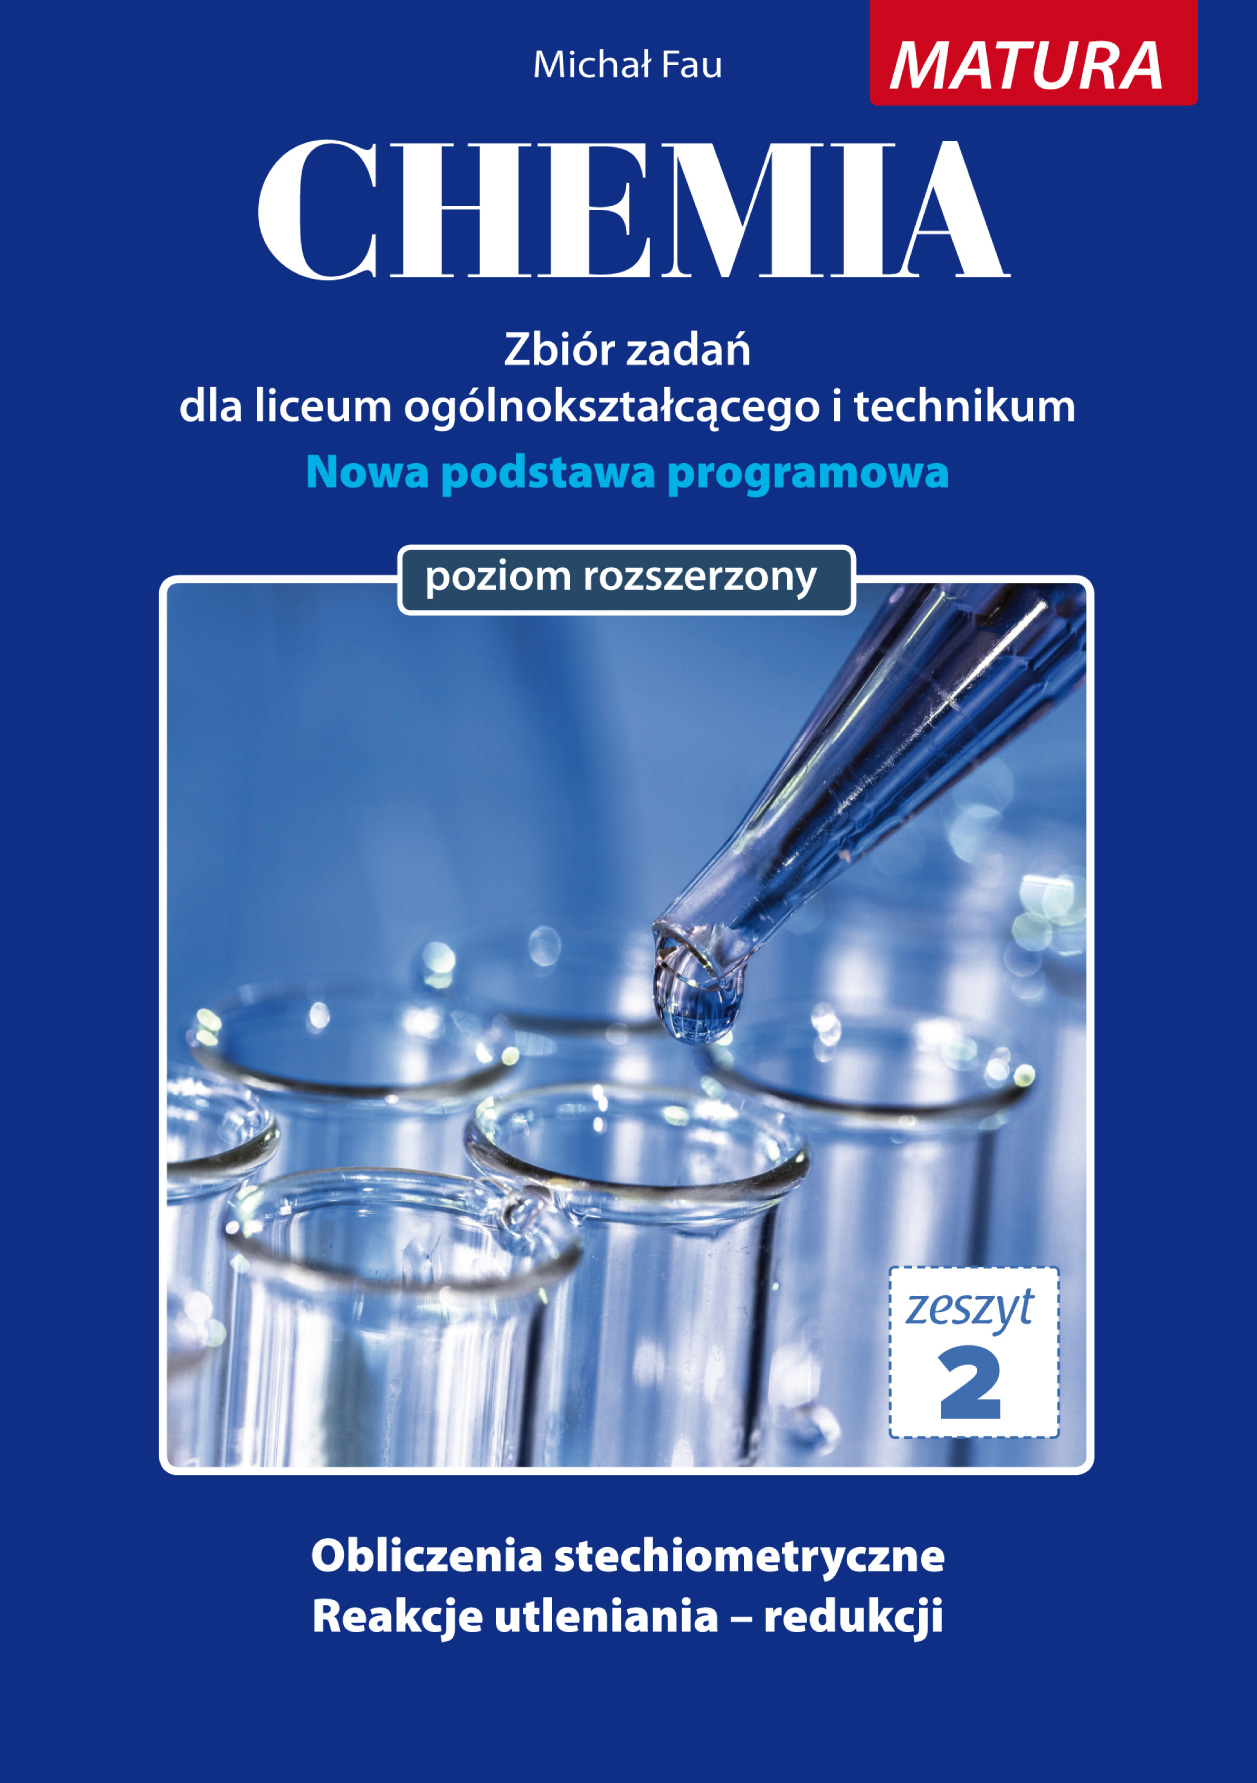 chemia 2 operon zbiór zadań pdf